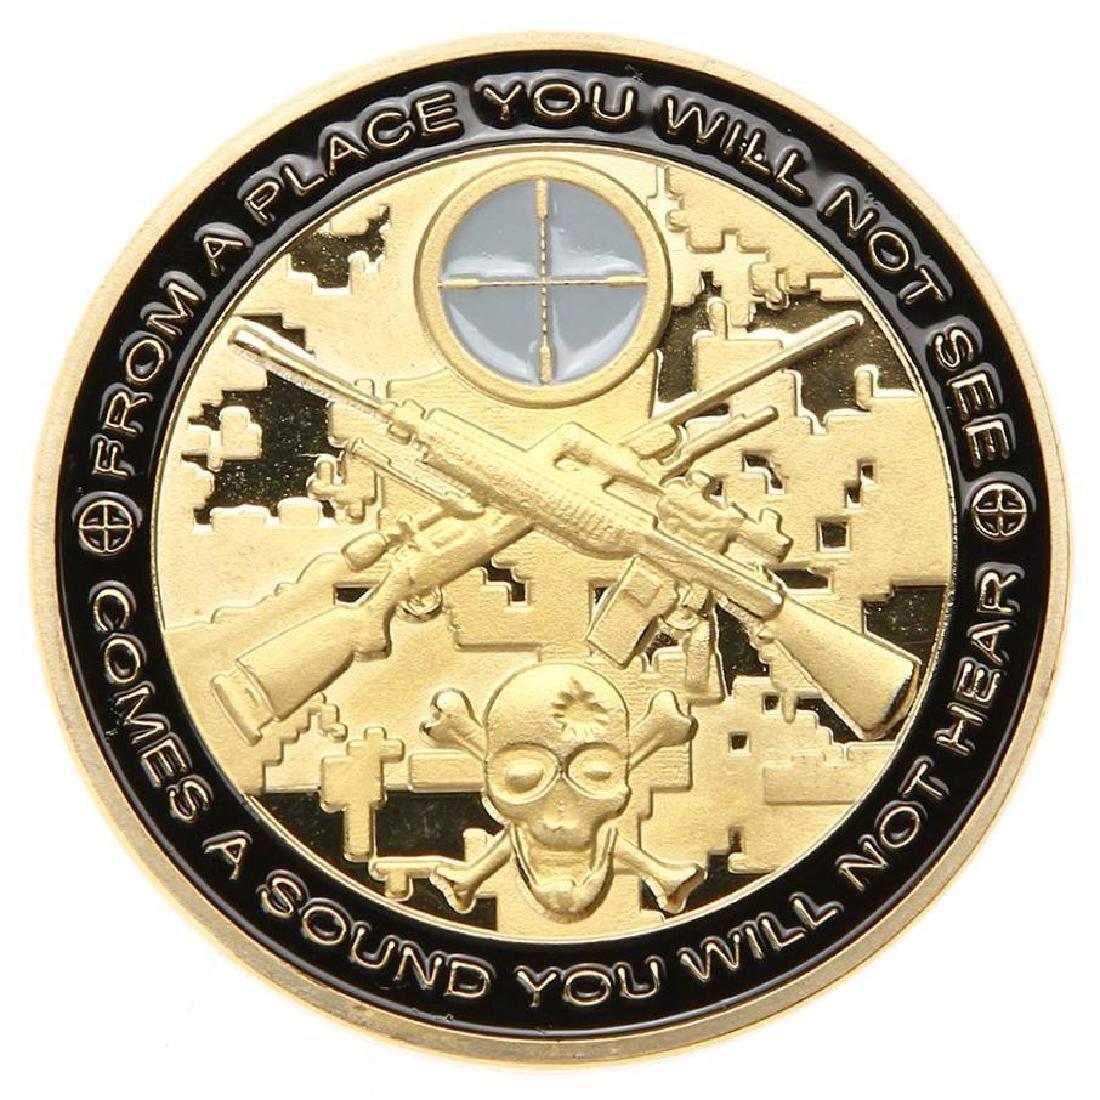 War Sniper Military Challenge Coin